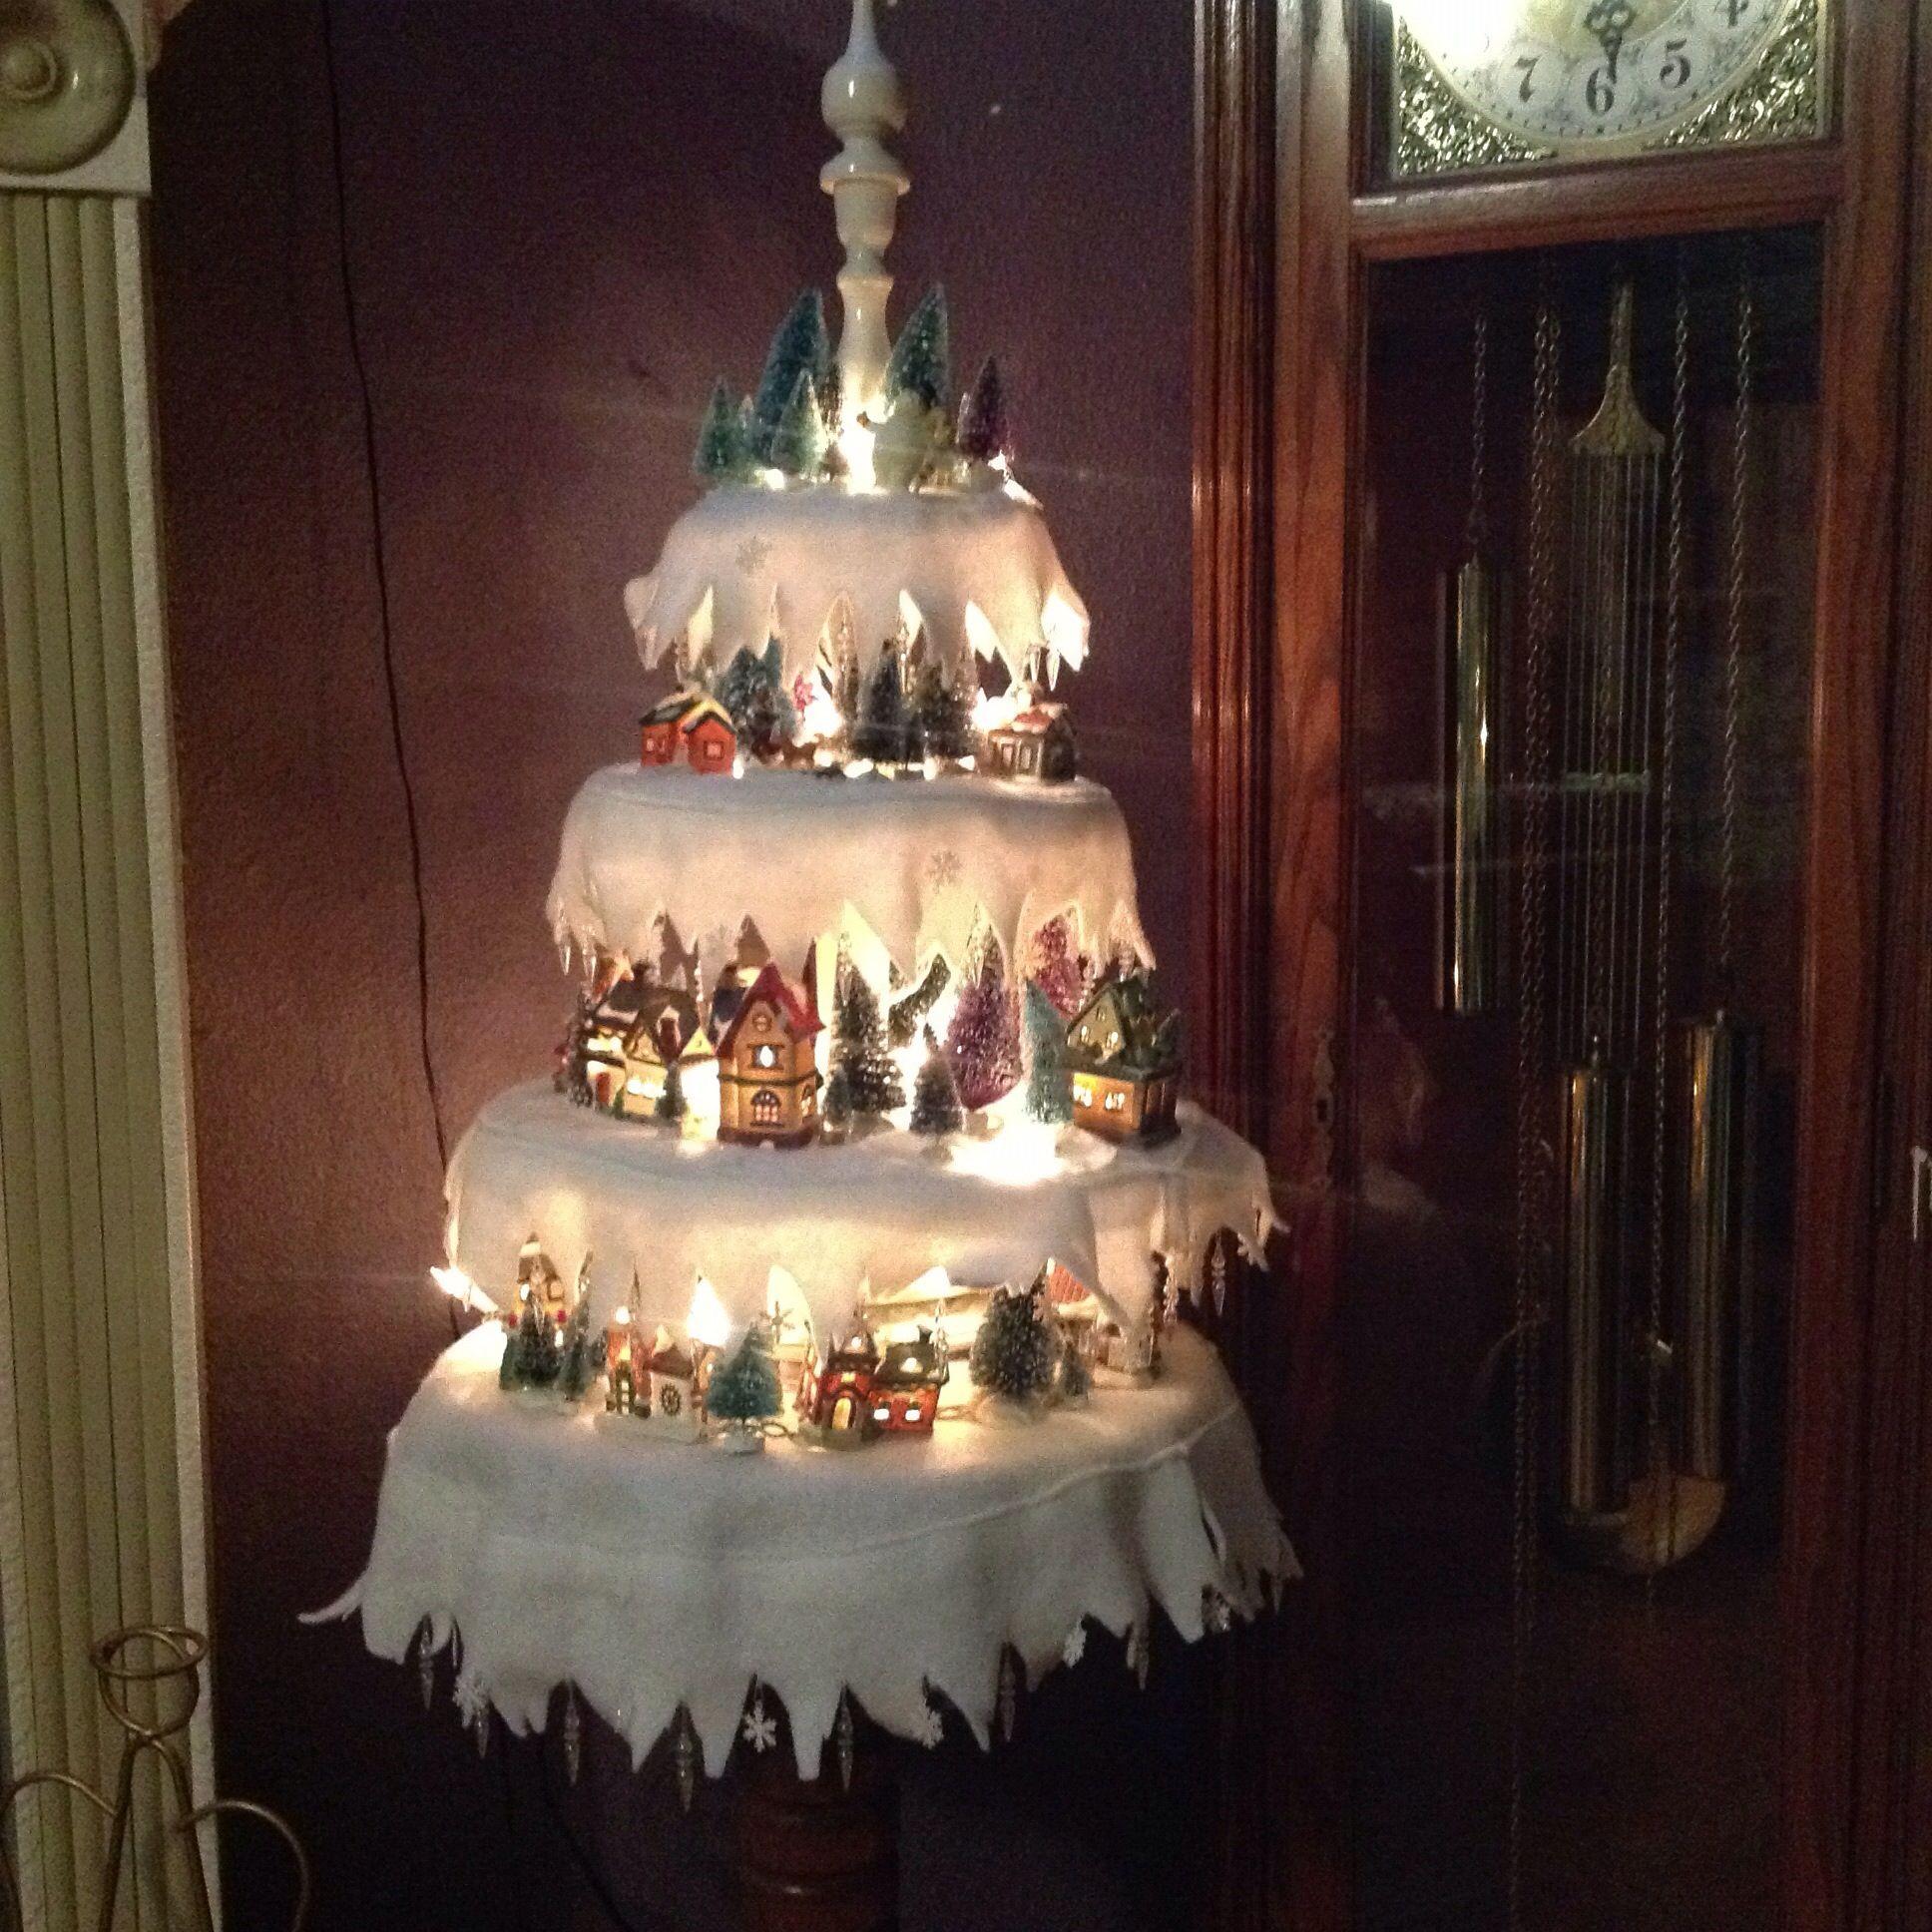 Miniature Village Christmas Tree. Neat Way To Display